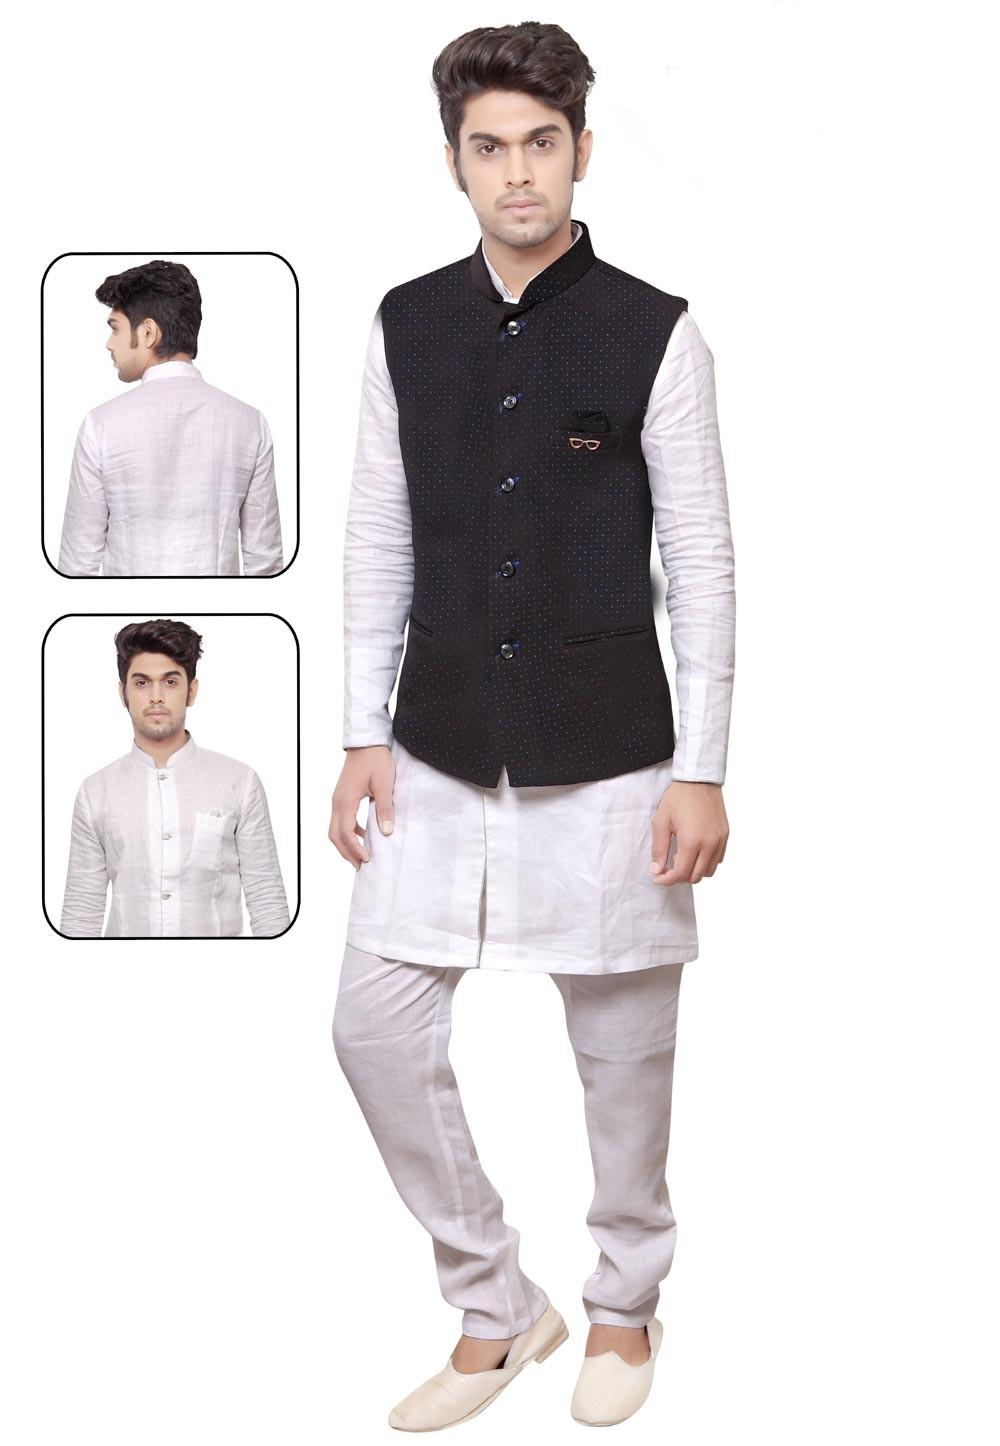 Exquisite White,Black Color Men's Readymade Kurta Pyjama.